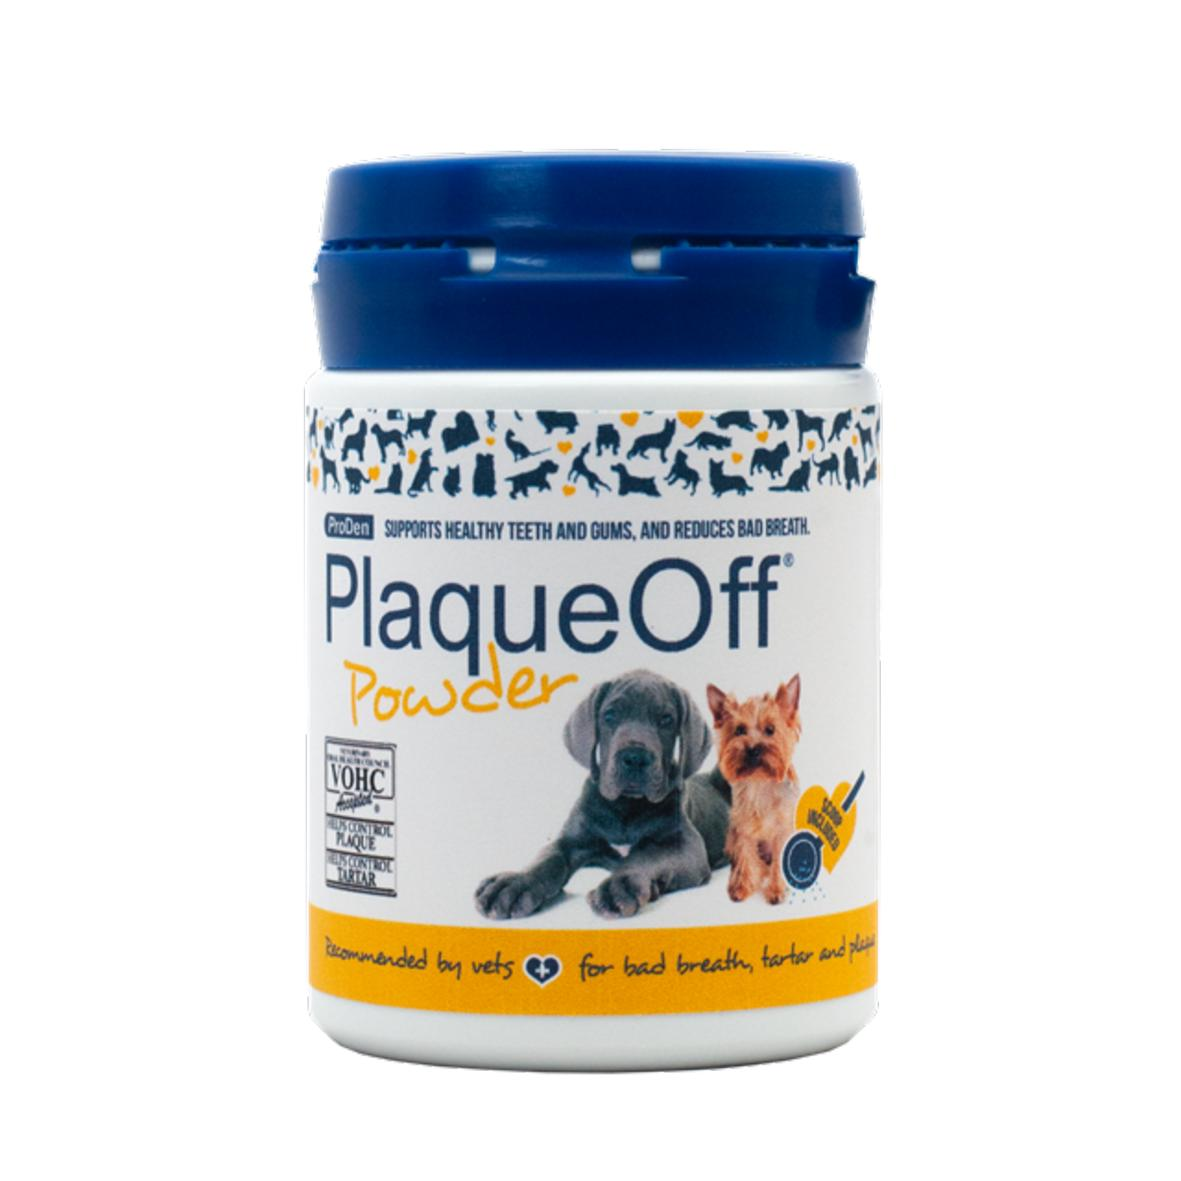 PlaqueOff Powder